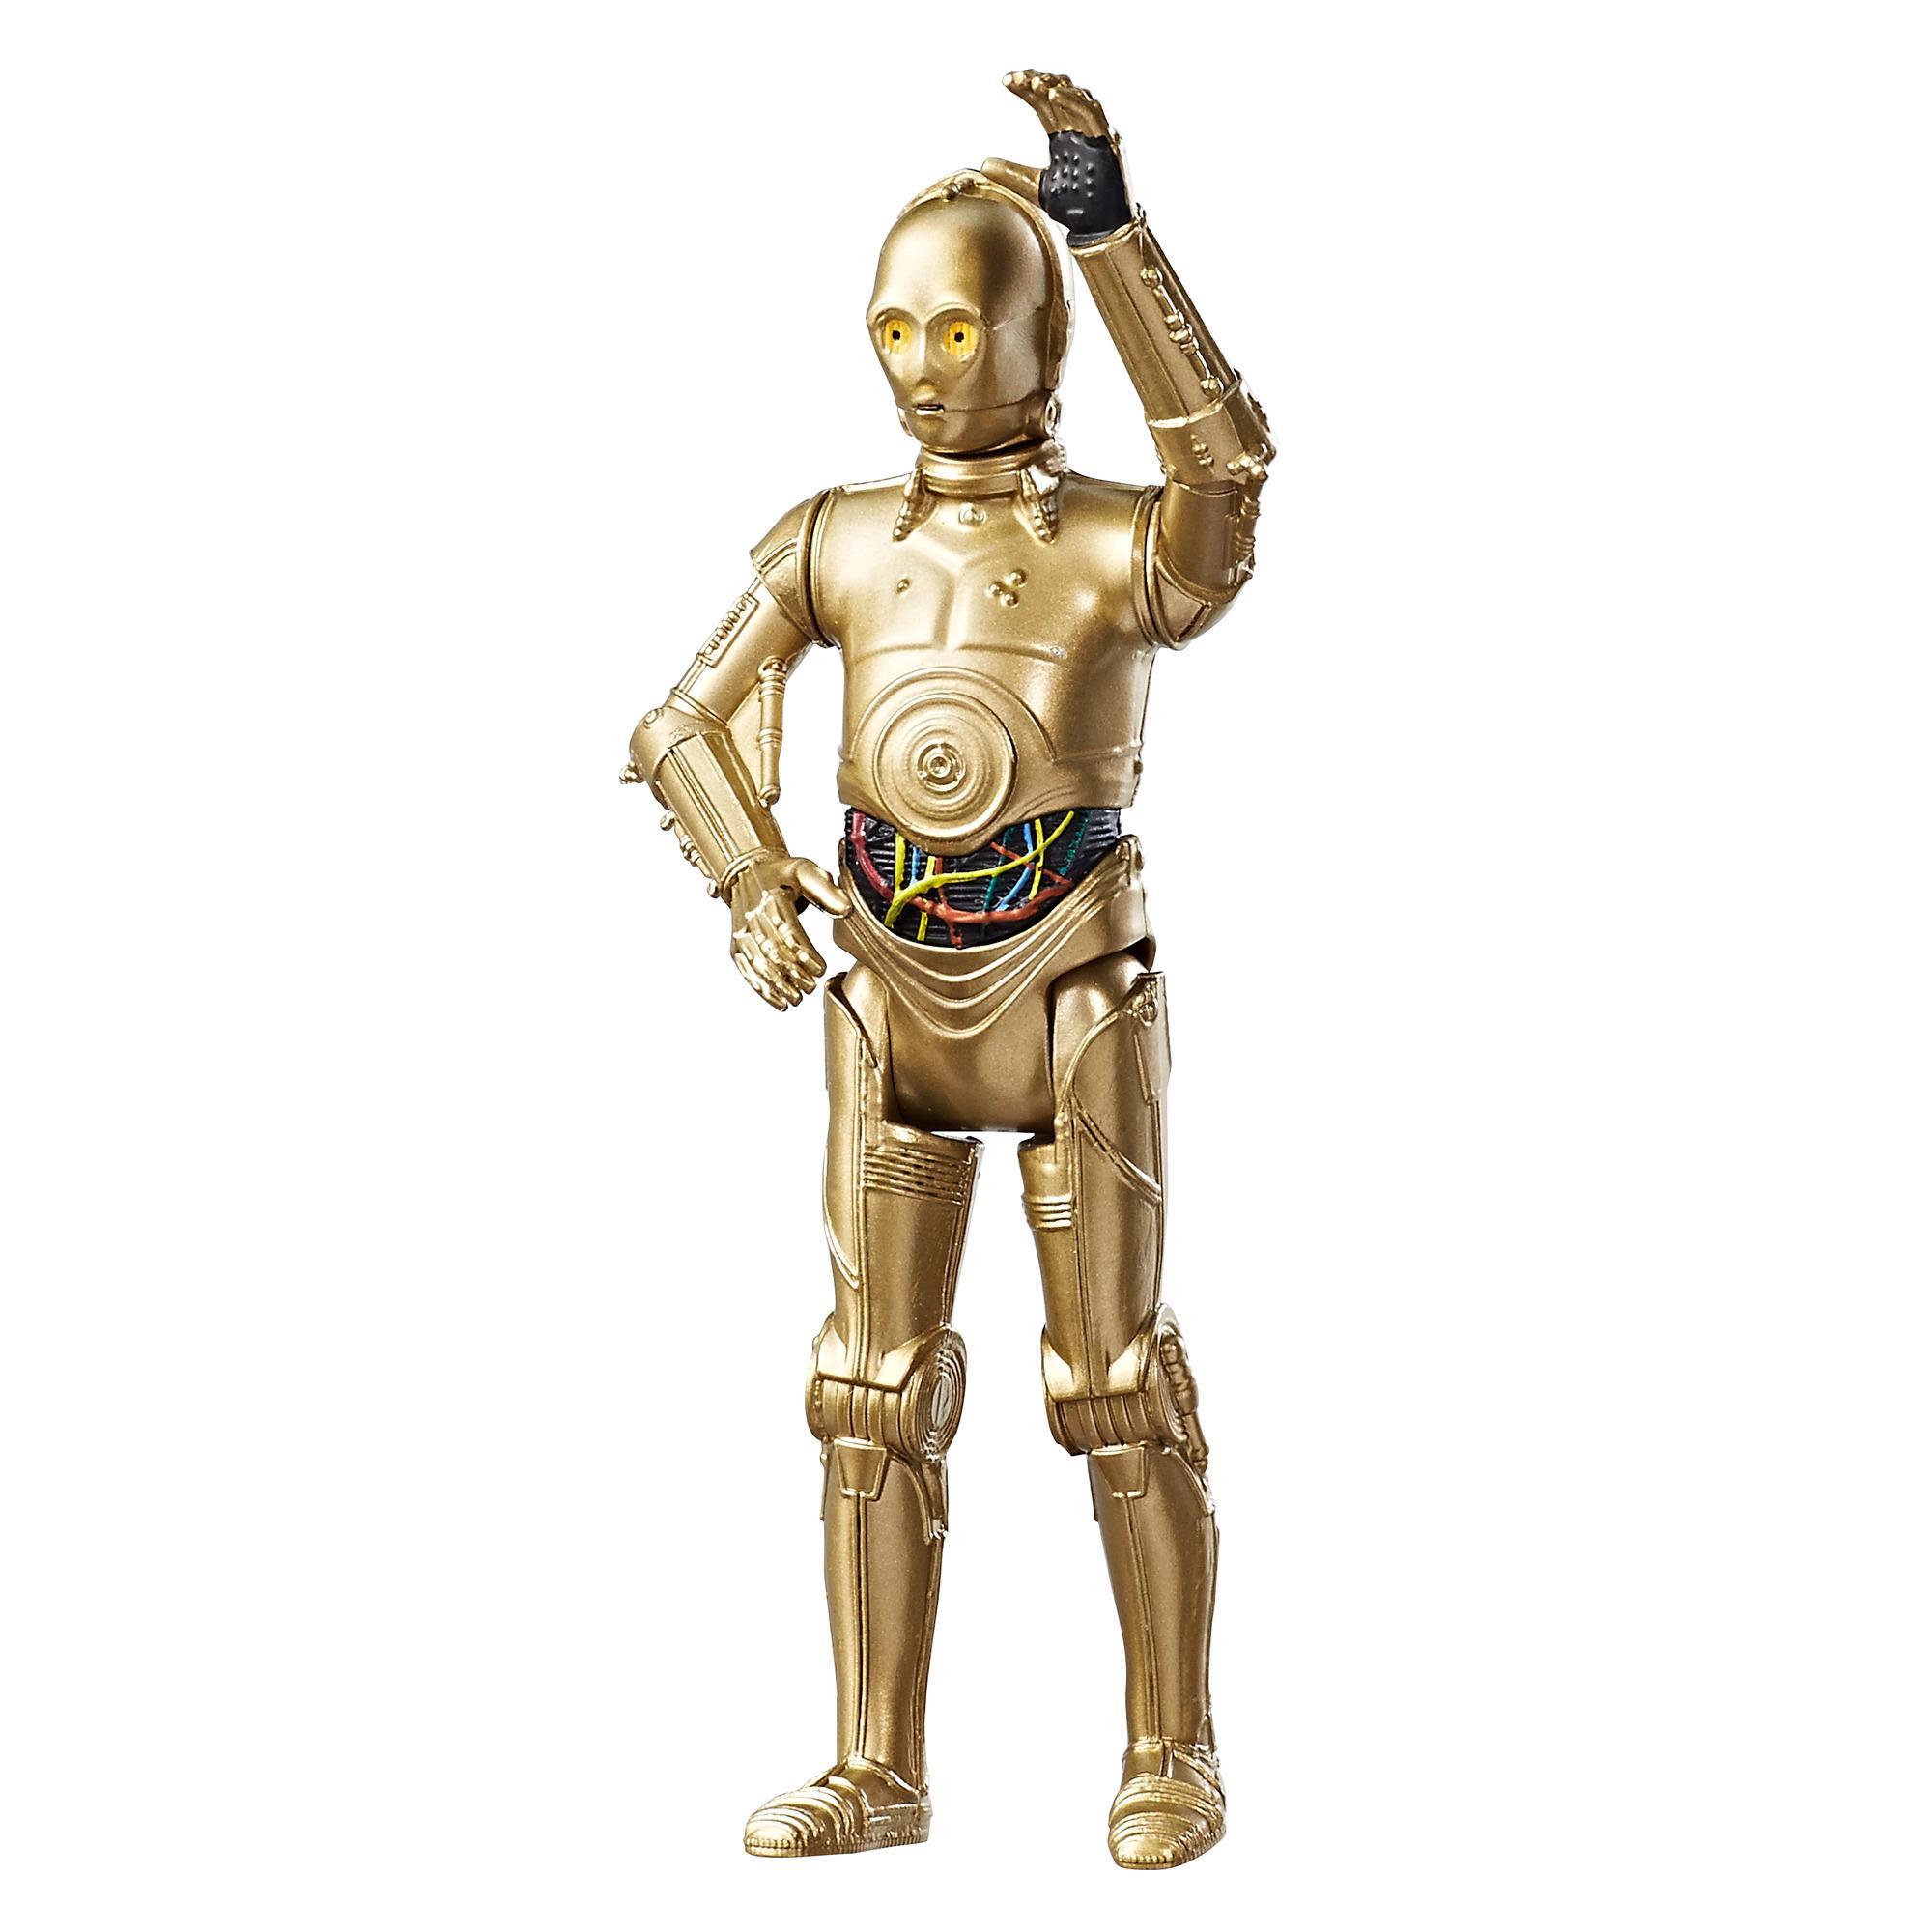 Star Wars - Figurine Force Link C-3PO